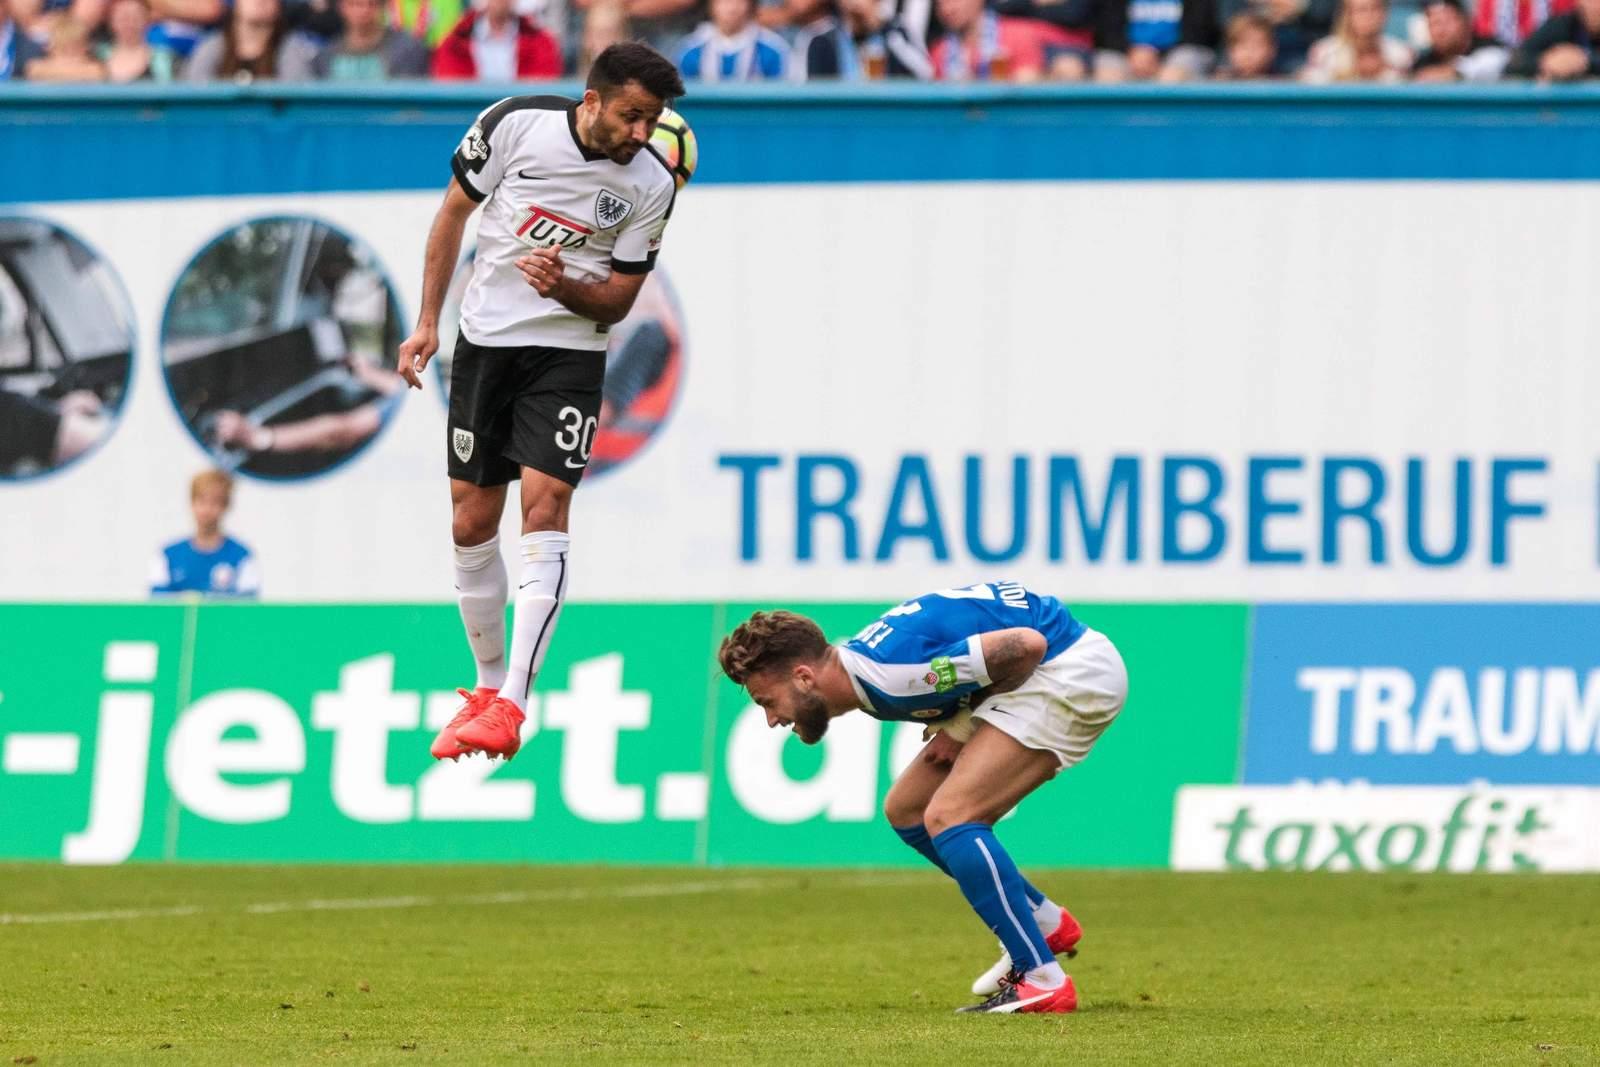 Denis Mangafic im Duell mit Rostocks Fabian Holthaus.